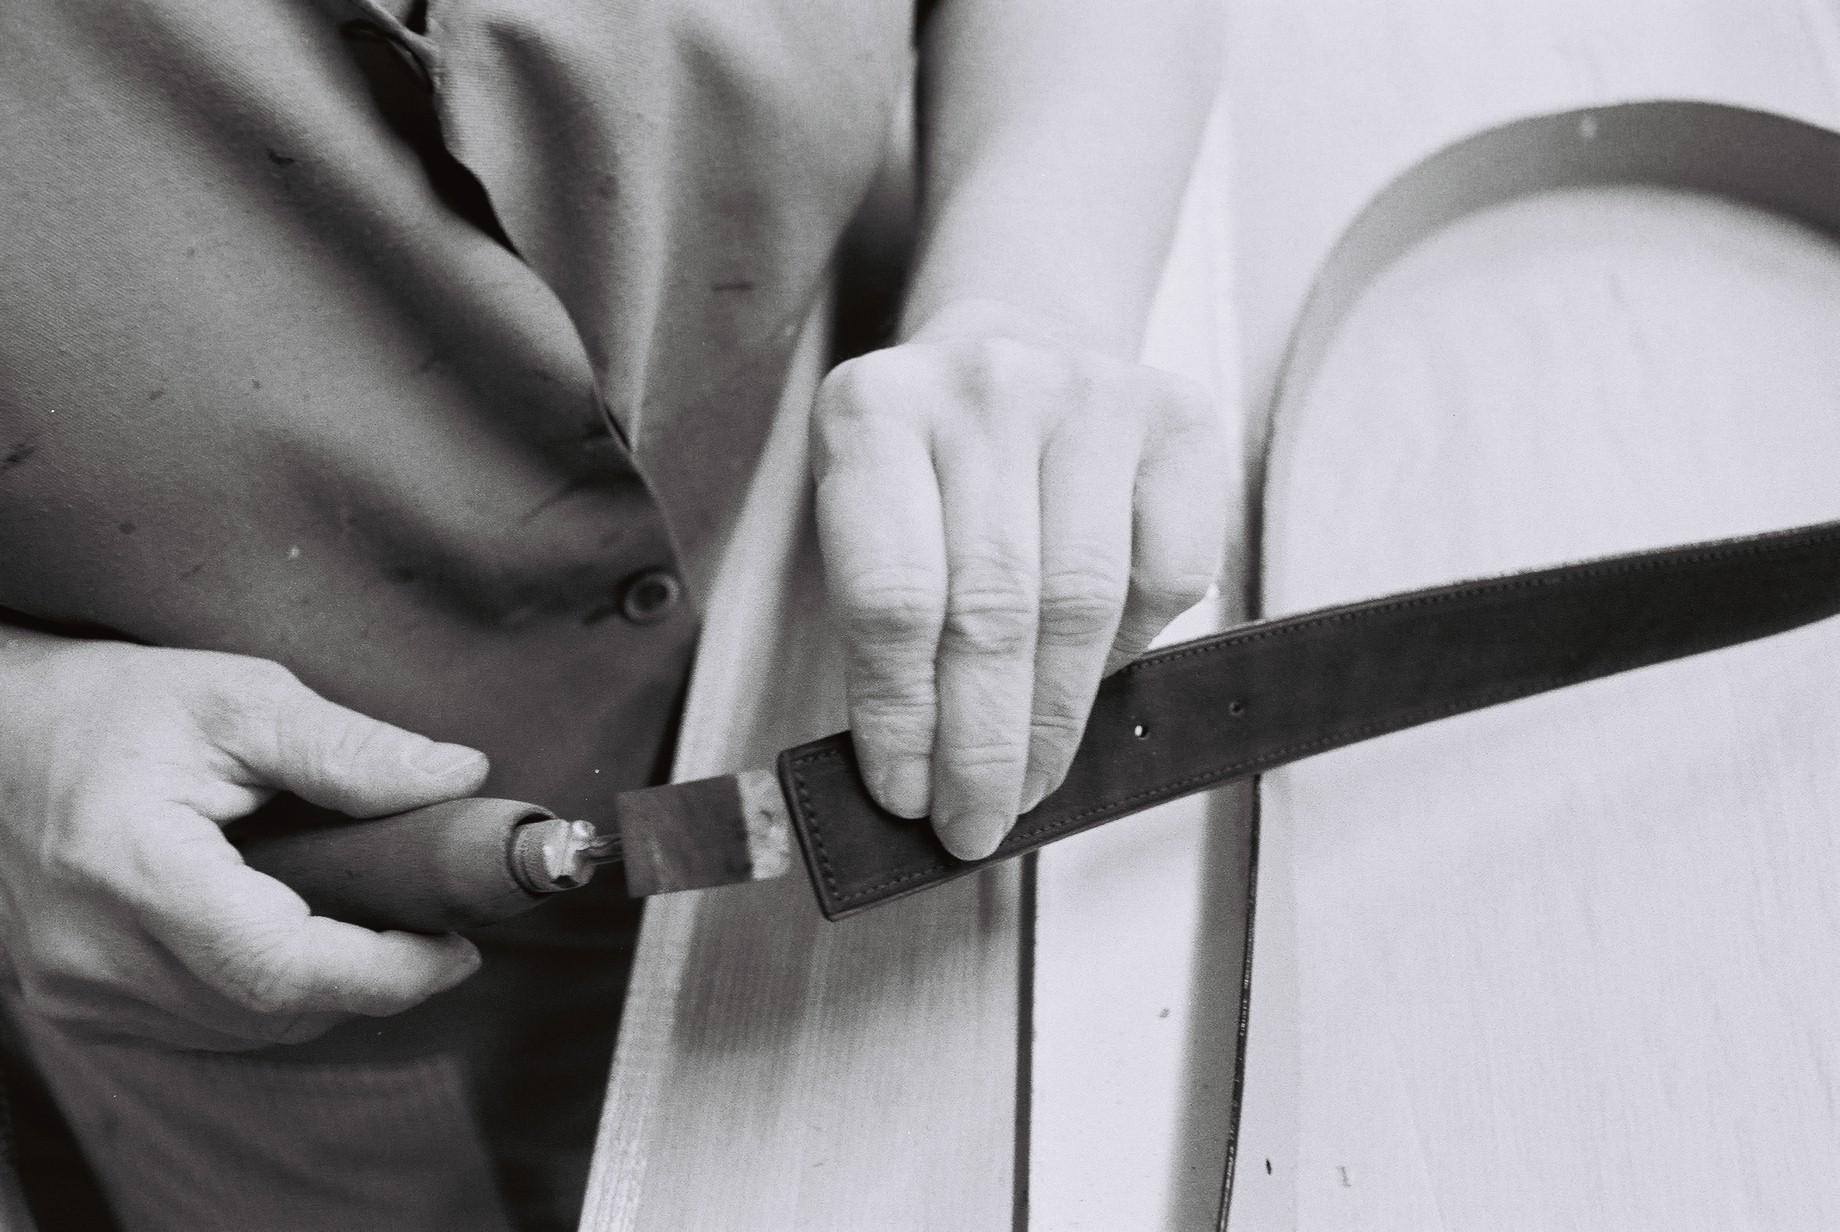 Artling_Ceinture sur mesure_Processus de fabrication_10